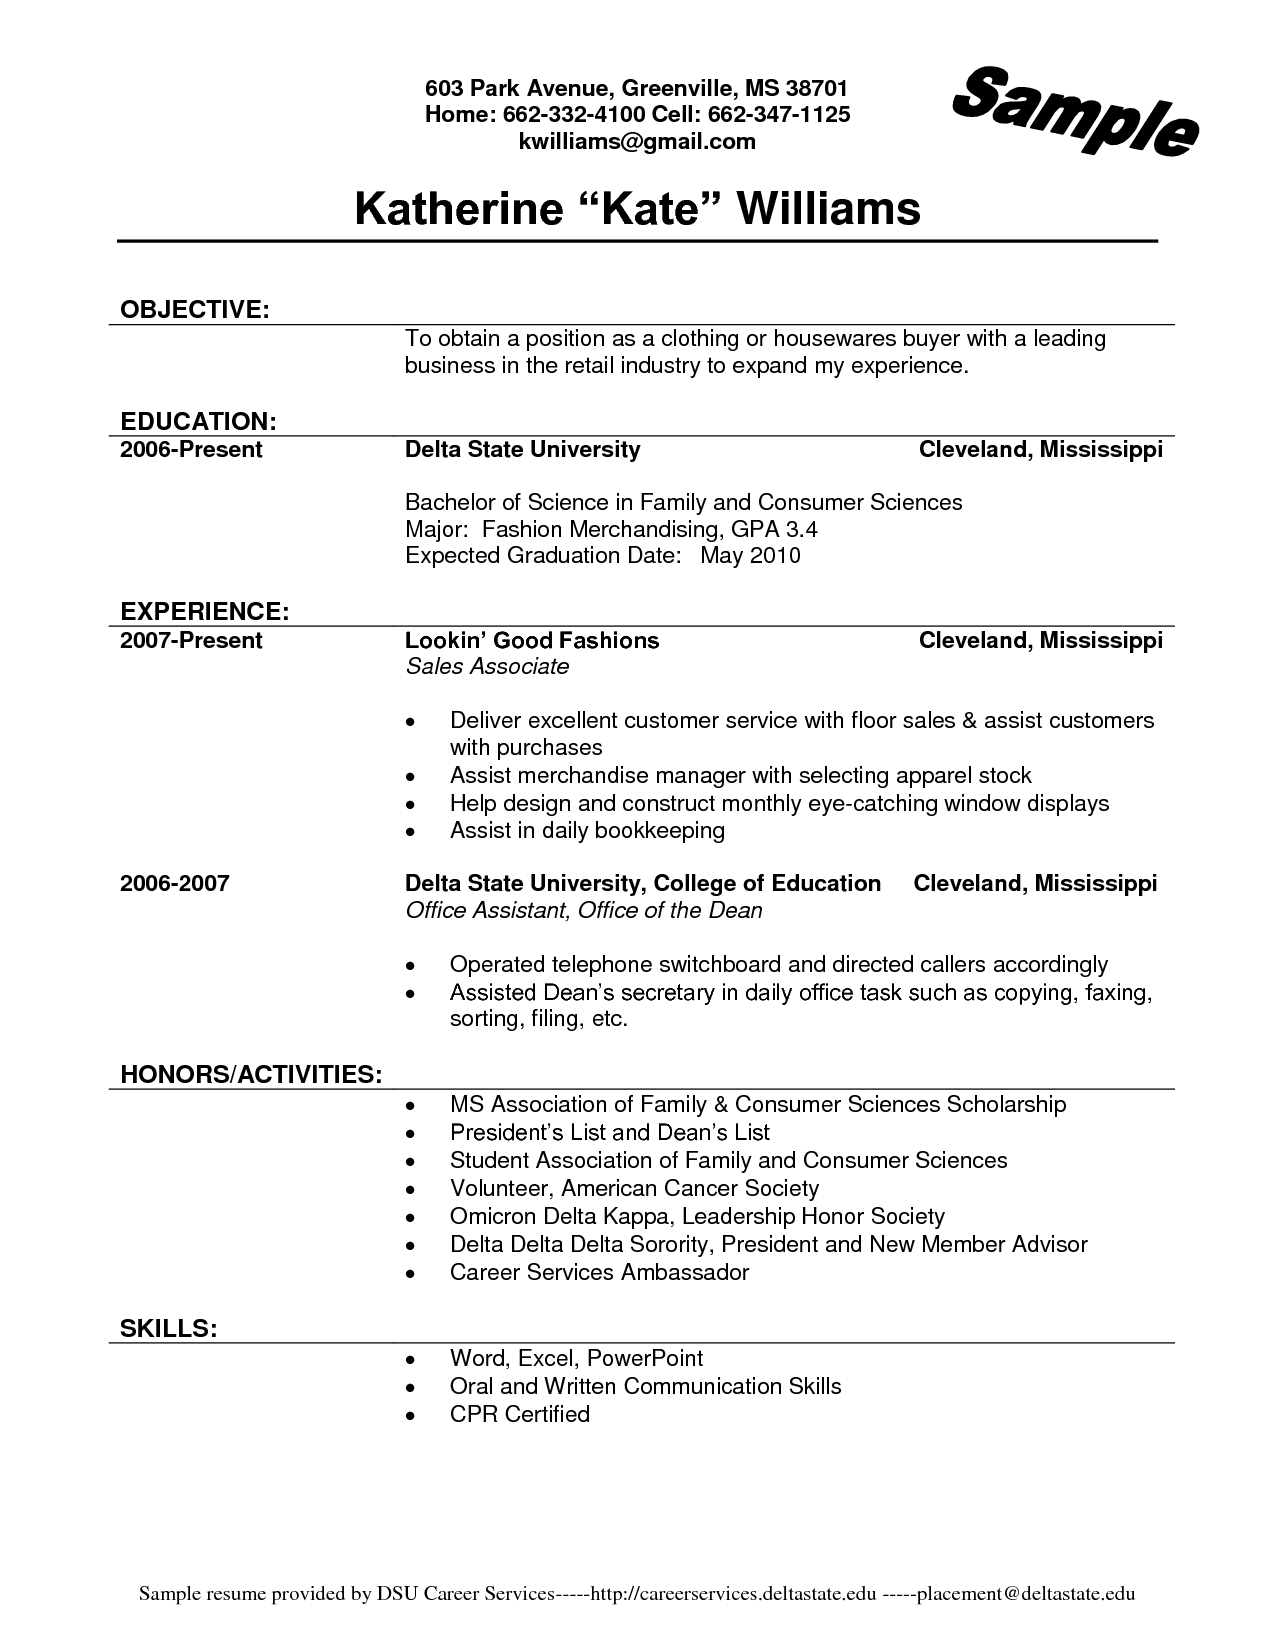 Pin By Resumeweb On Job Resume Format